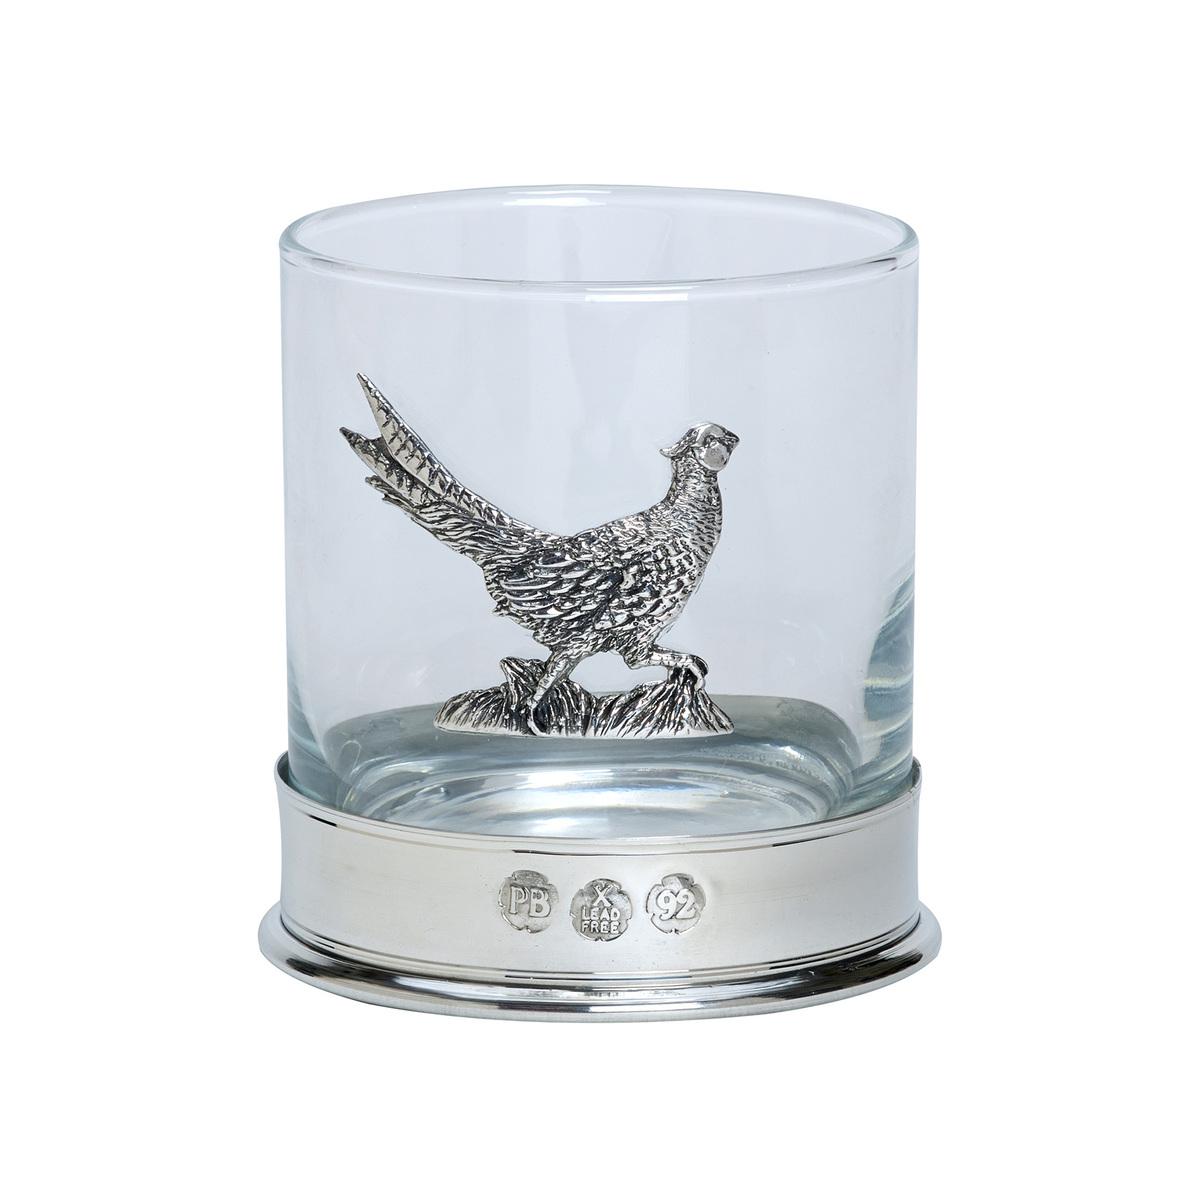 Pheasant Whisky Glasses - Pair